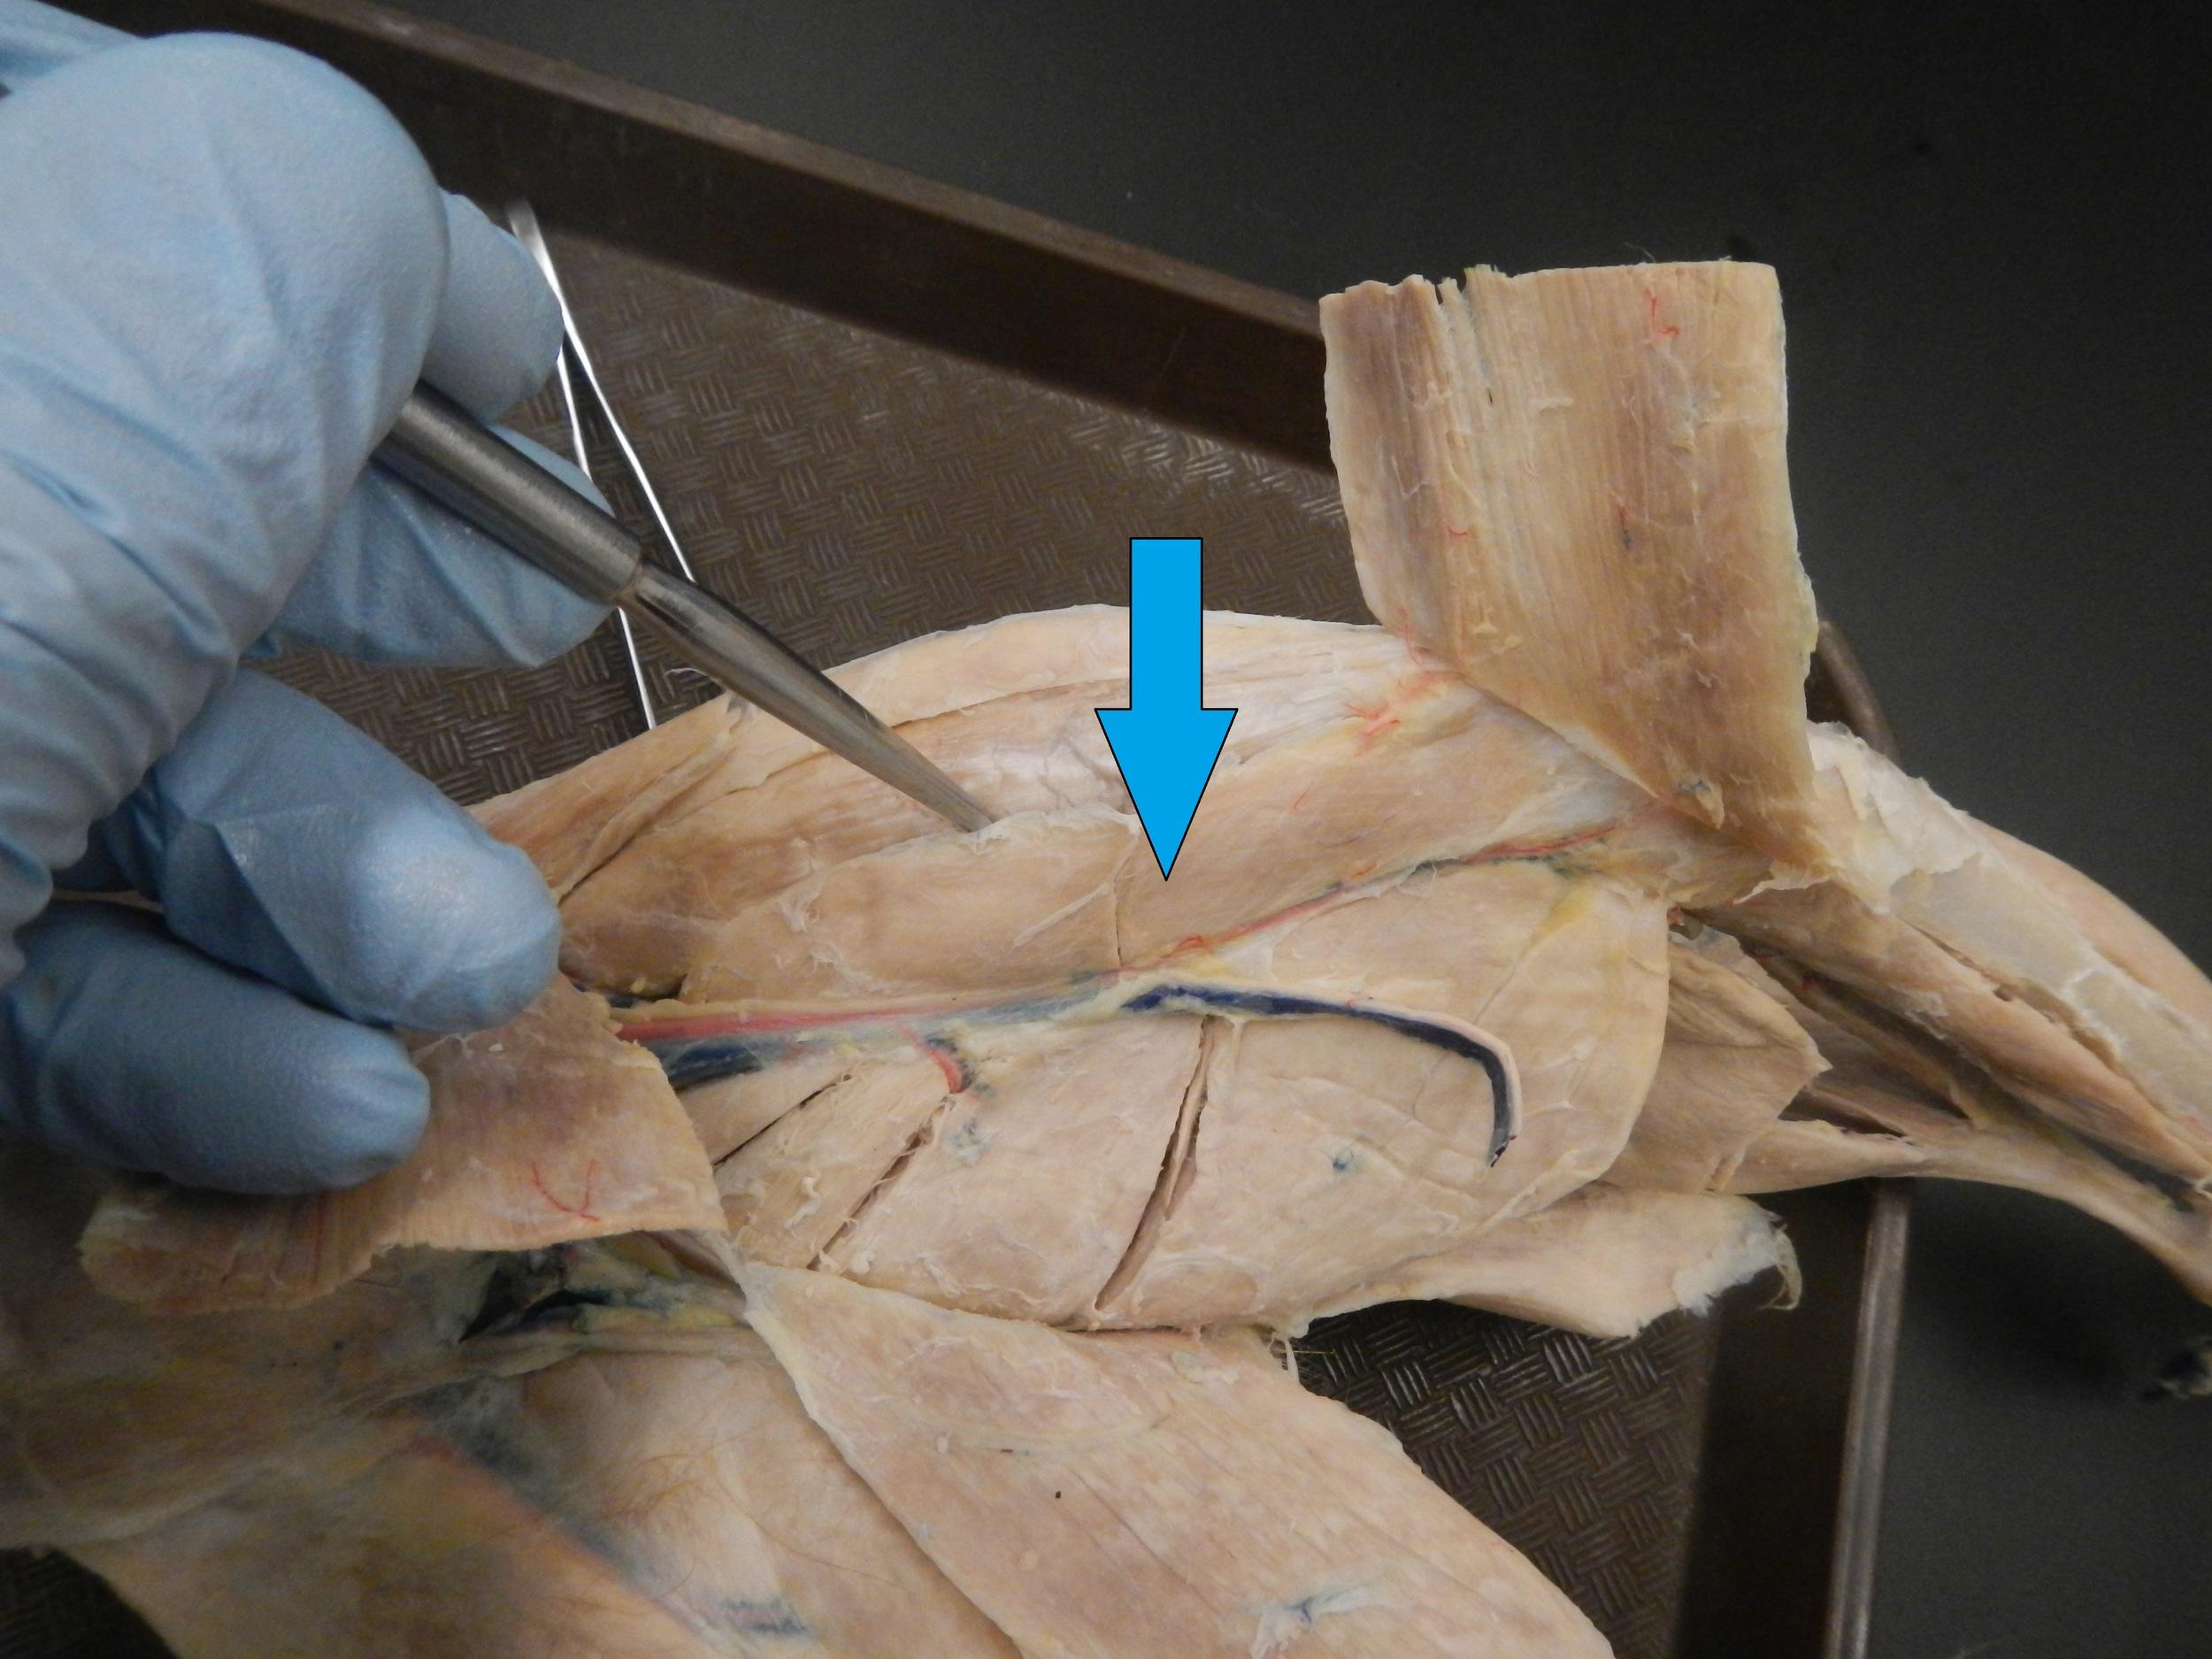 Vastus Medialis   O - Medial aspect of femur  I - Patella via quadriceps tendon, then tibial tuberosity via patellar tendon  F - Knee extension